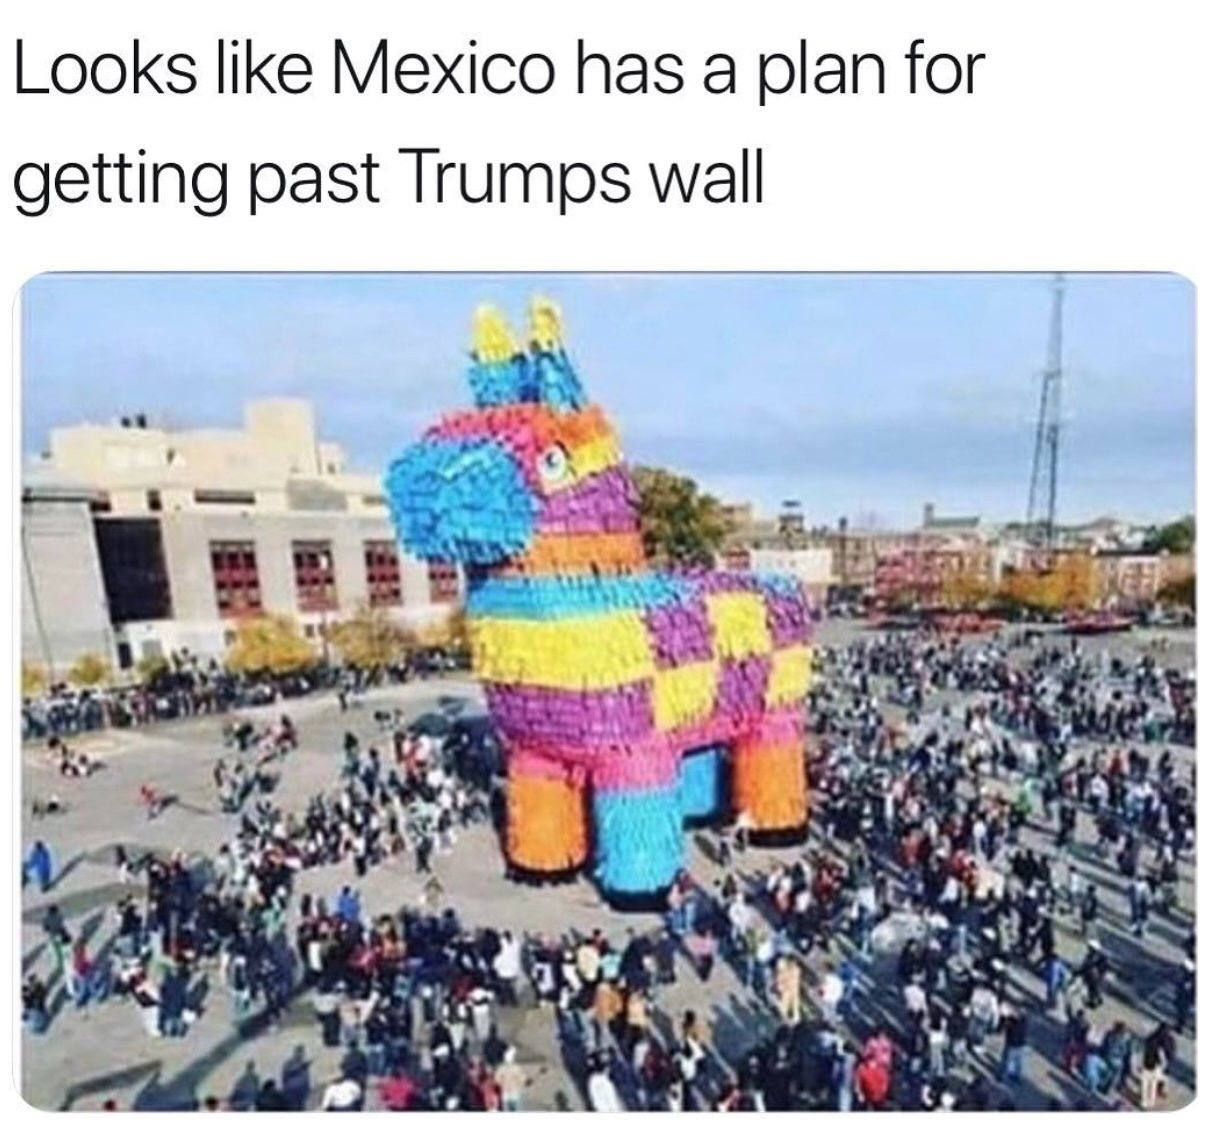 trump trumped - meme